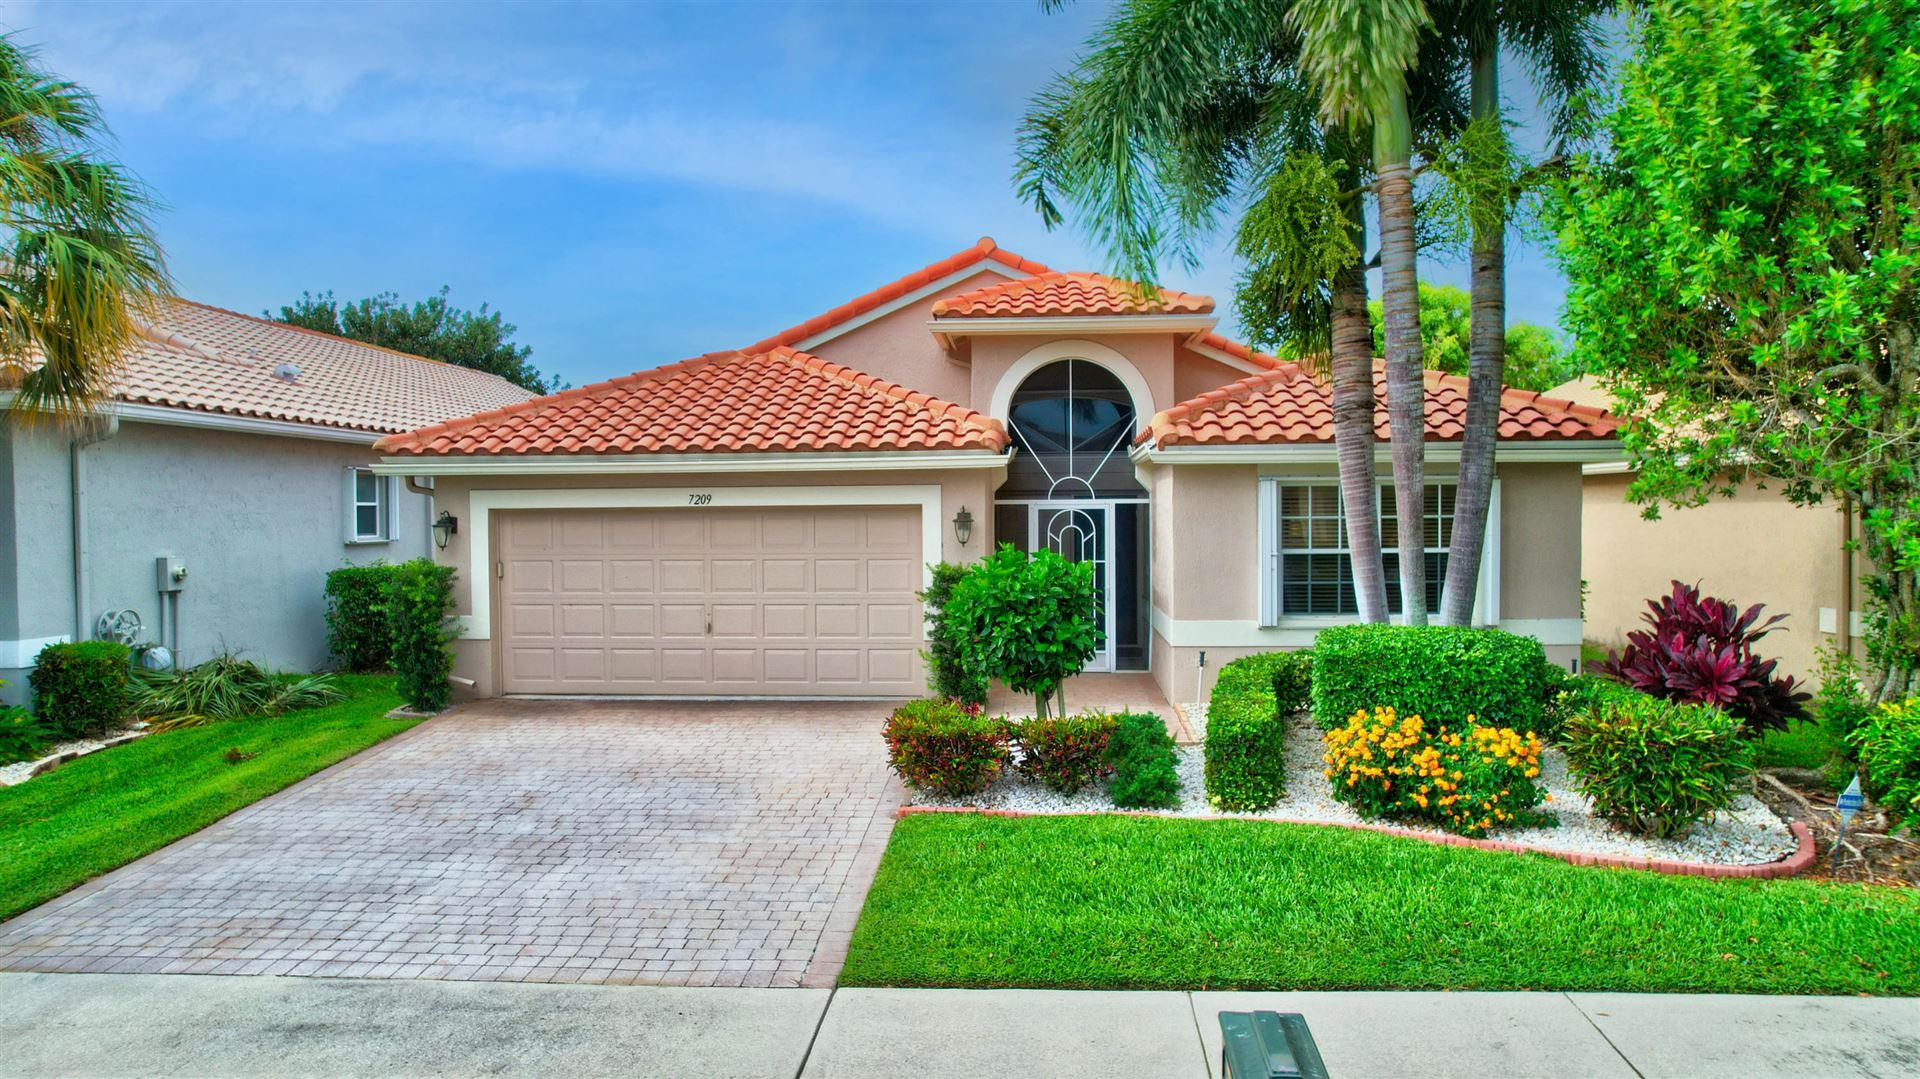 7209 Haviland Circle, Boynton Beach, FL 33437 - MLS#: RX-10716346